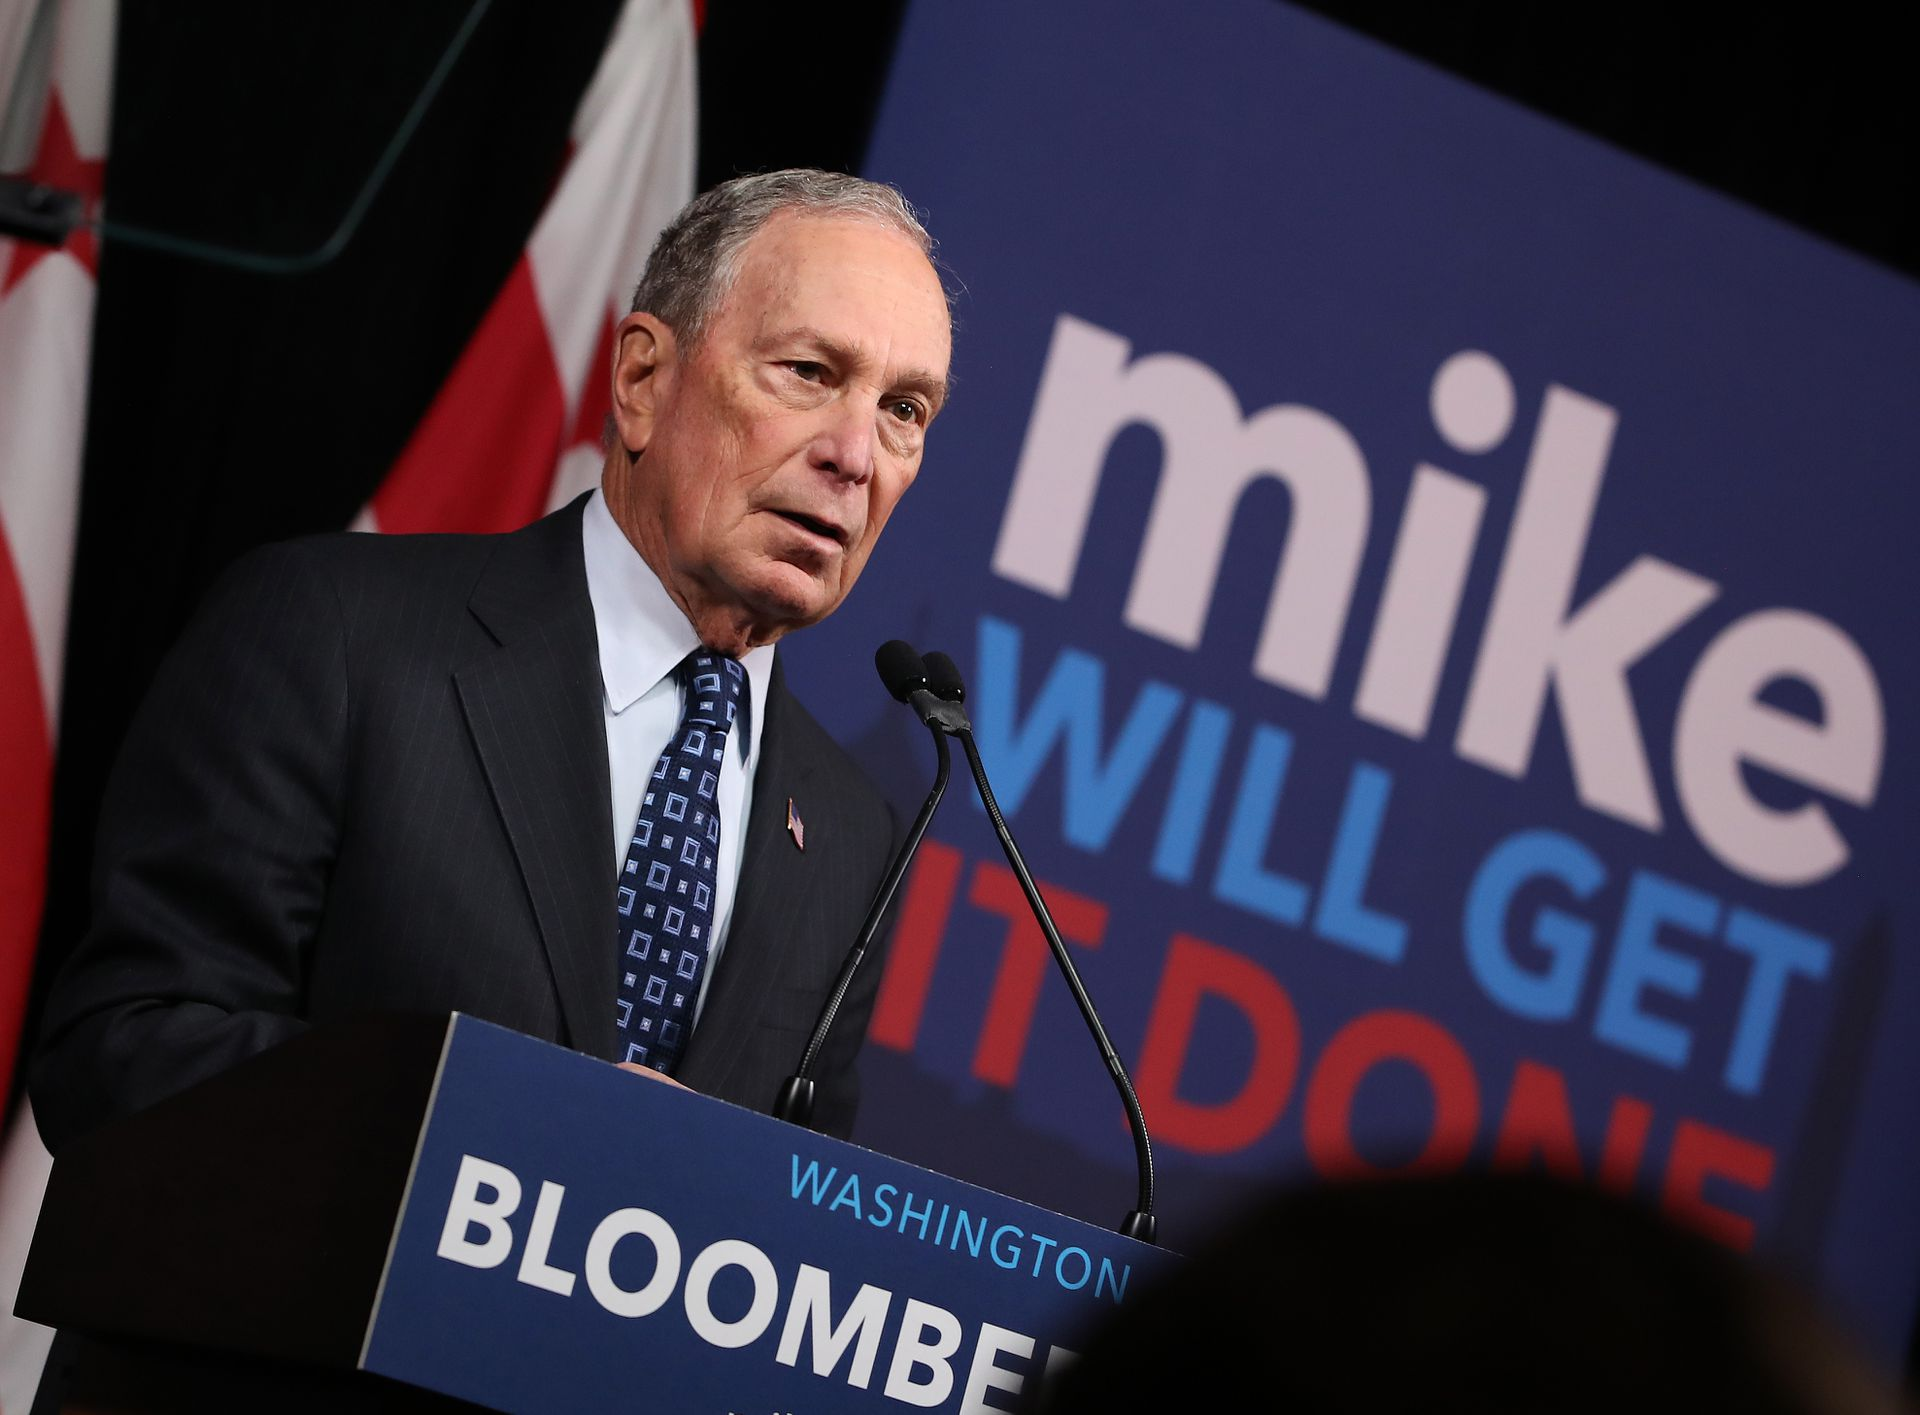 The anti-Bloomberg barrage begins